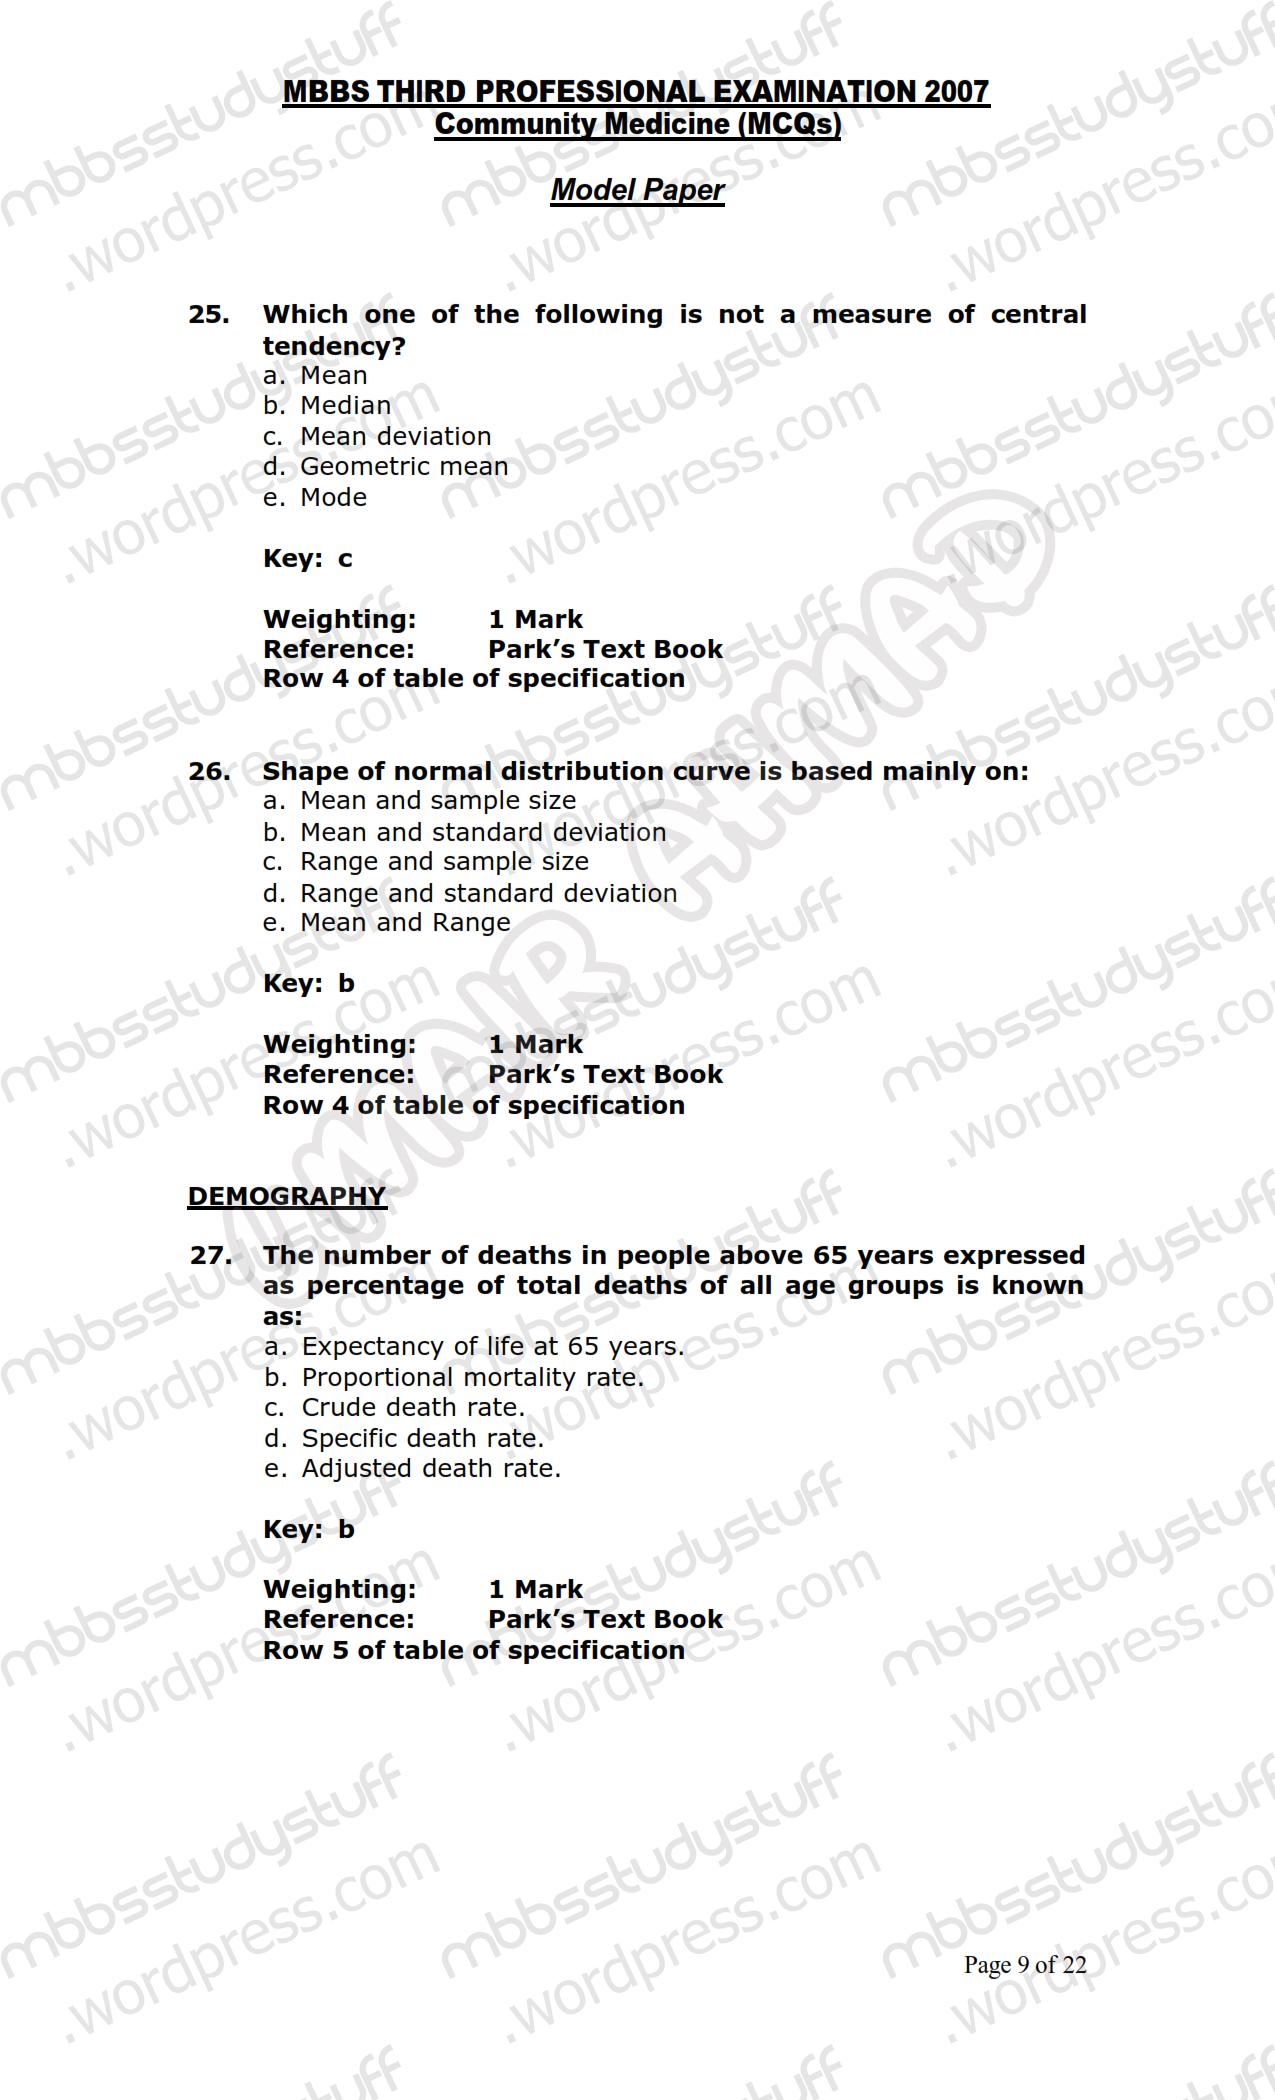 COMMUNITY MEDICINE MCQ MODEL PAPER 2007   MBBS Study Stuff